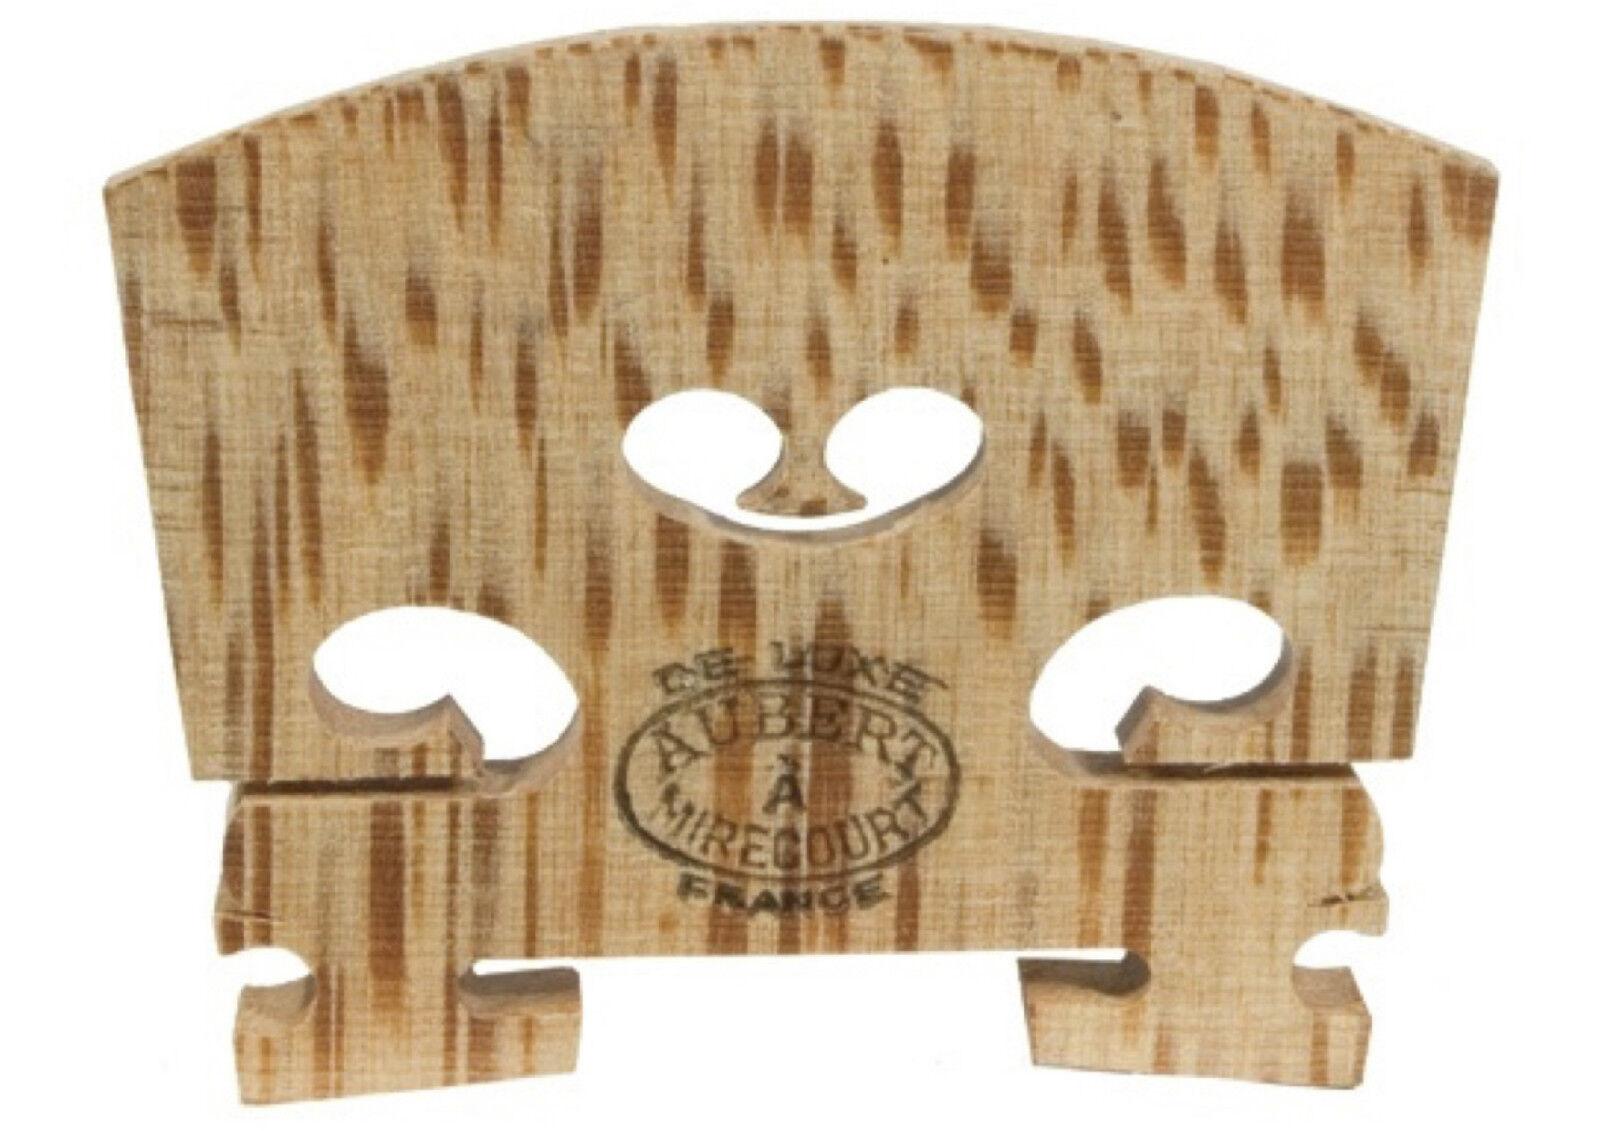 41mm - 4/4 Aubert mirecourt DELUXE aged maple uncut violin bridge made in France